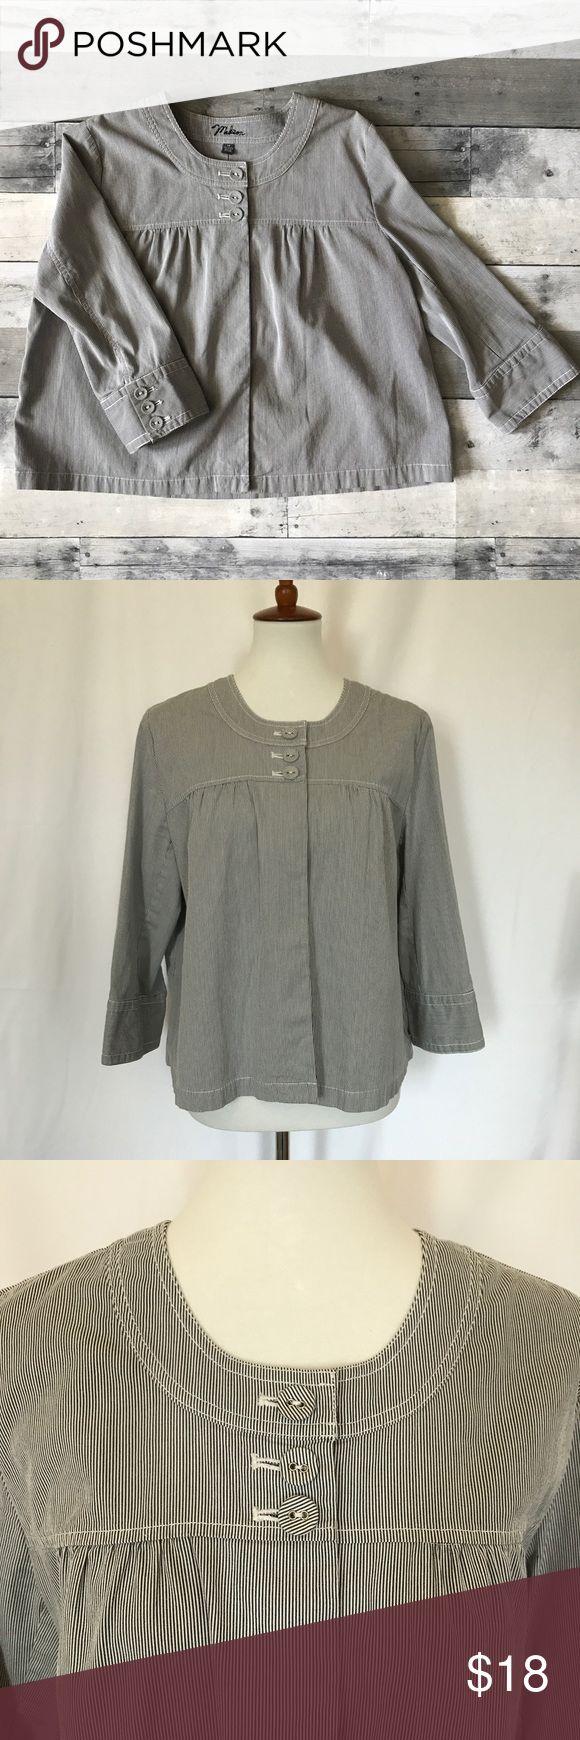 Selling this Seersucker 3/4 Sleeve Cropped Jacket, SZ 14 on Poshmark! My username is: jojoclark123. #shopmycloset #poshmark #fashion #shopping #style #forsale #Madison #Jackets & Blazers